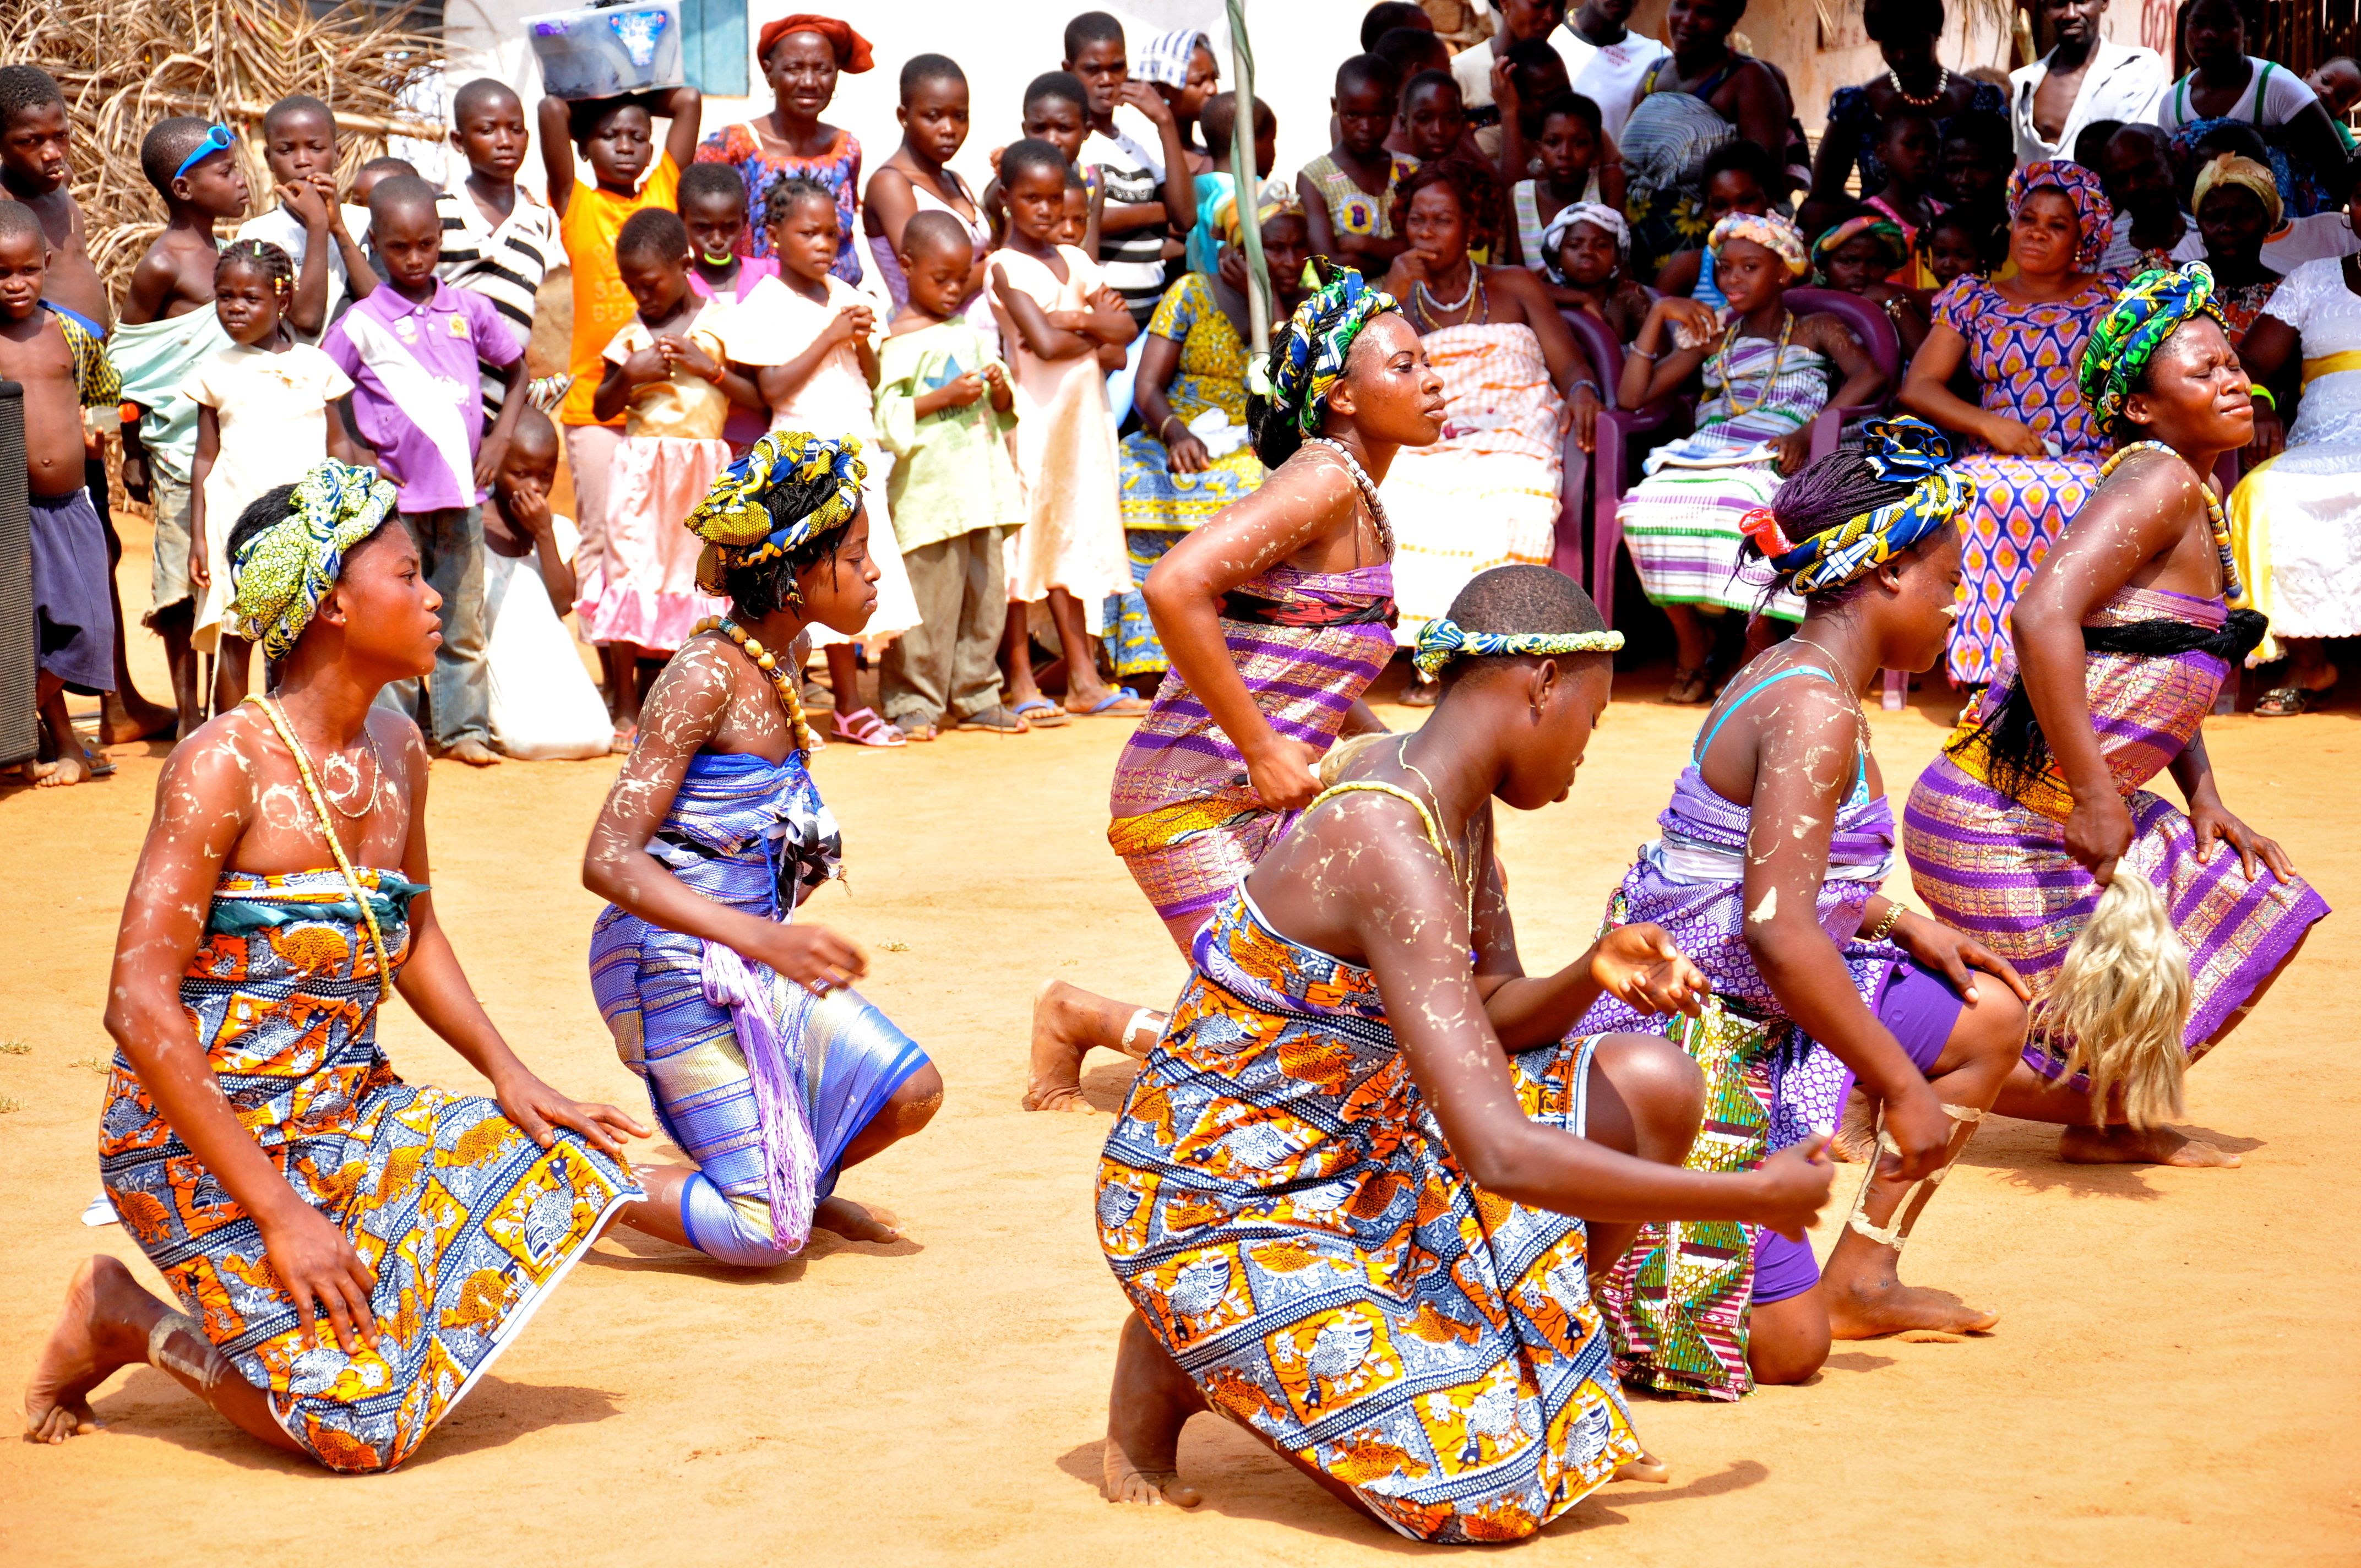 Pictures Of Ghana Women Club Dancing 95